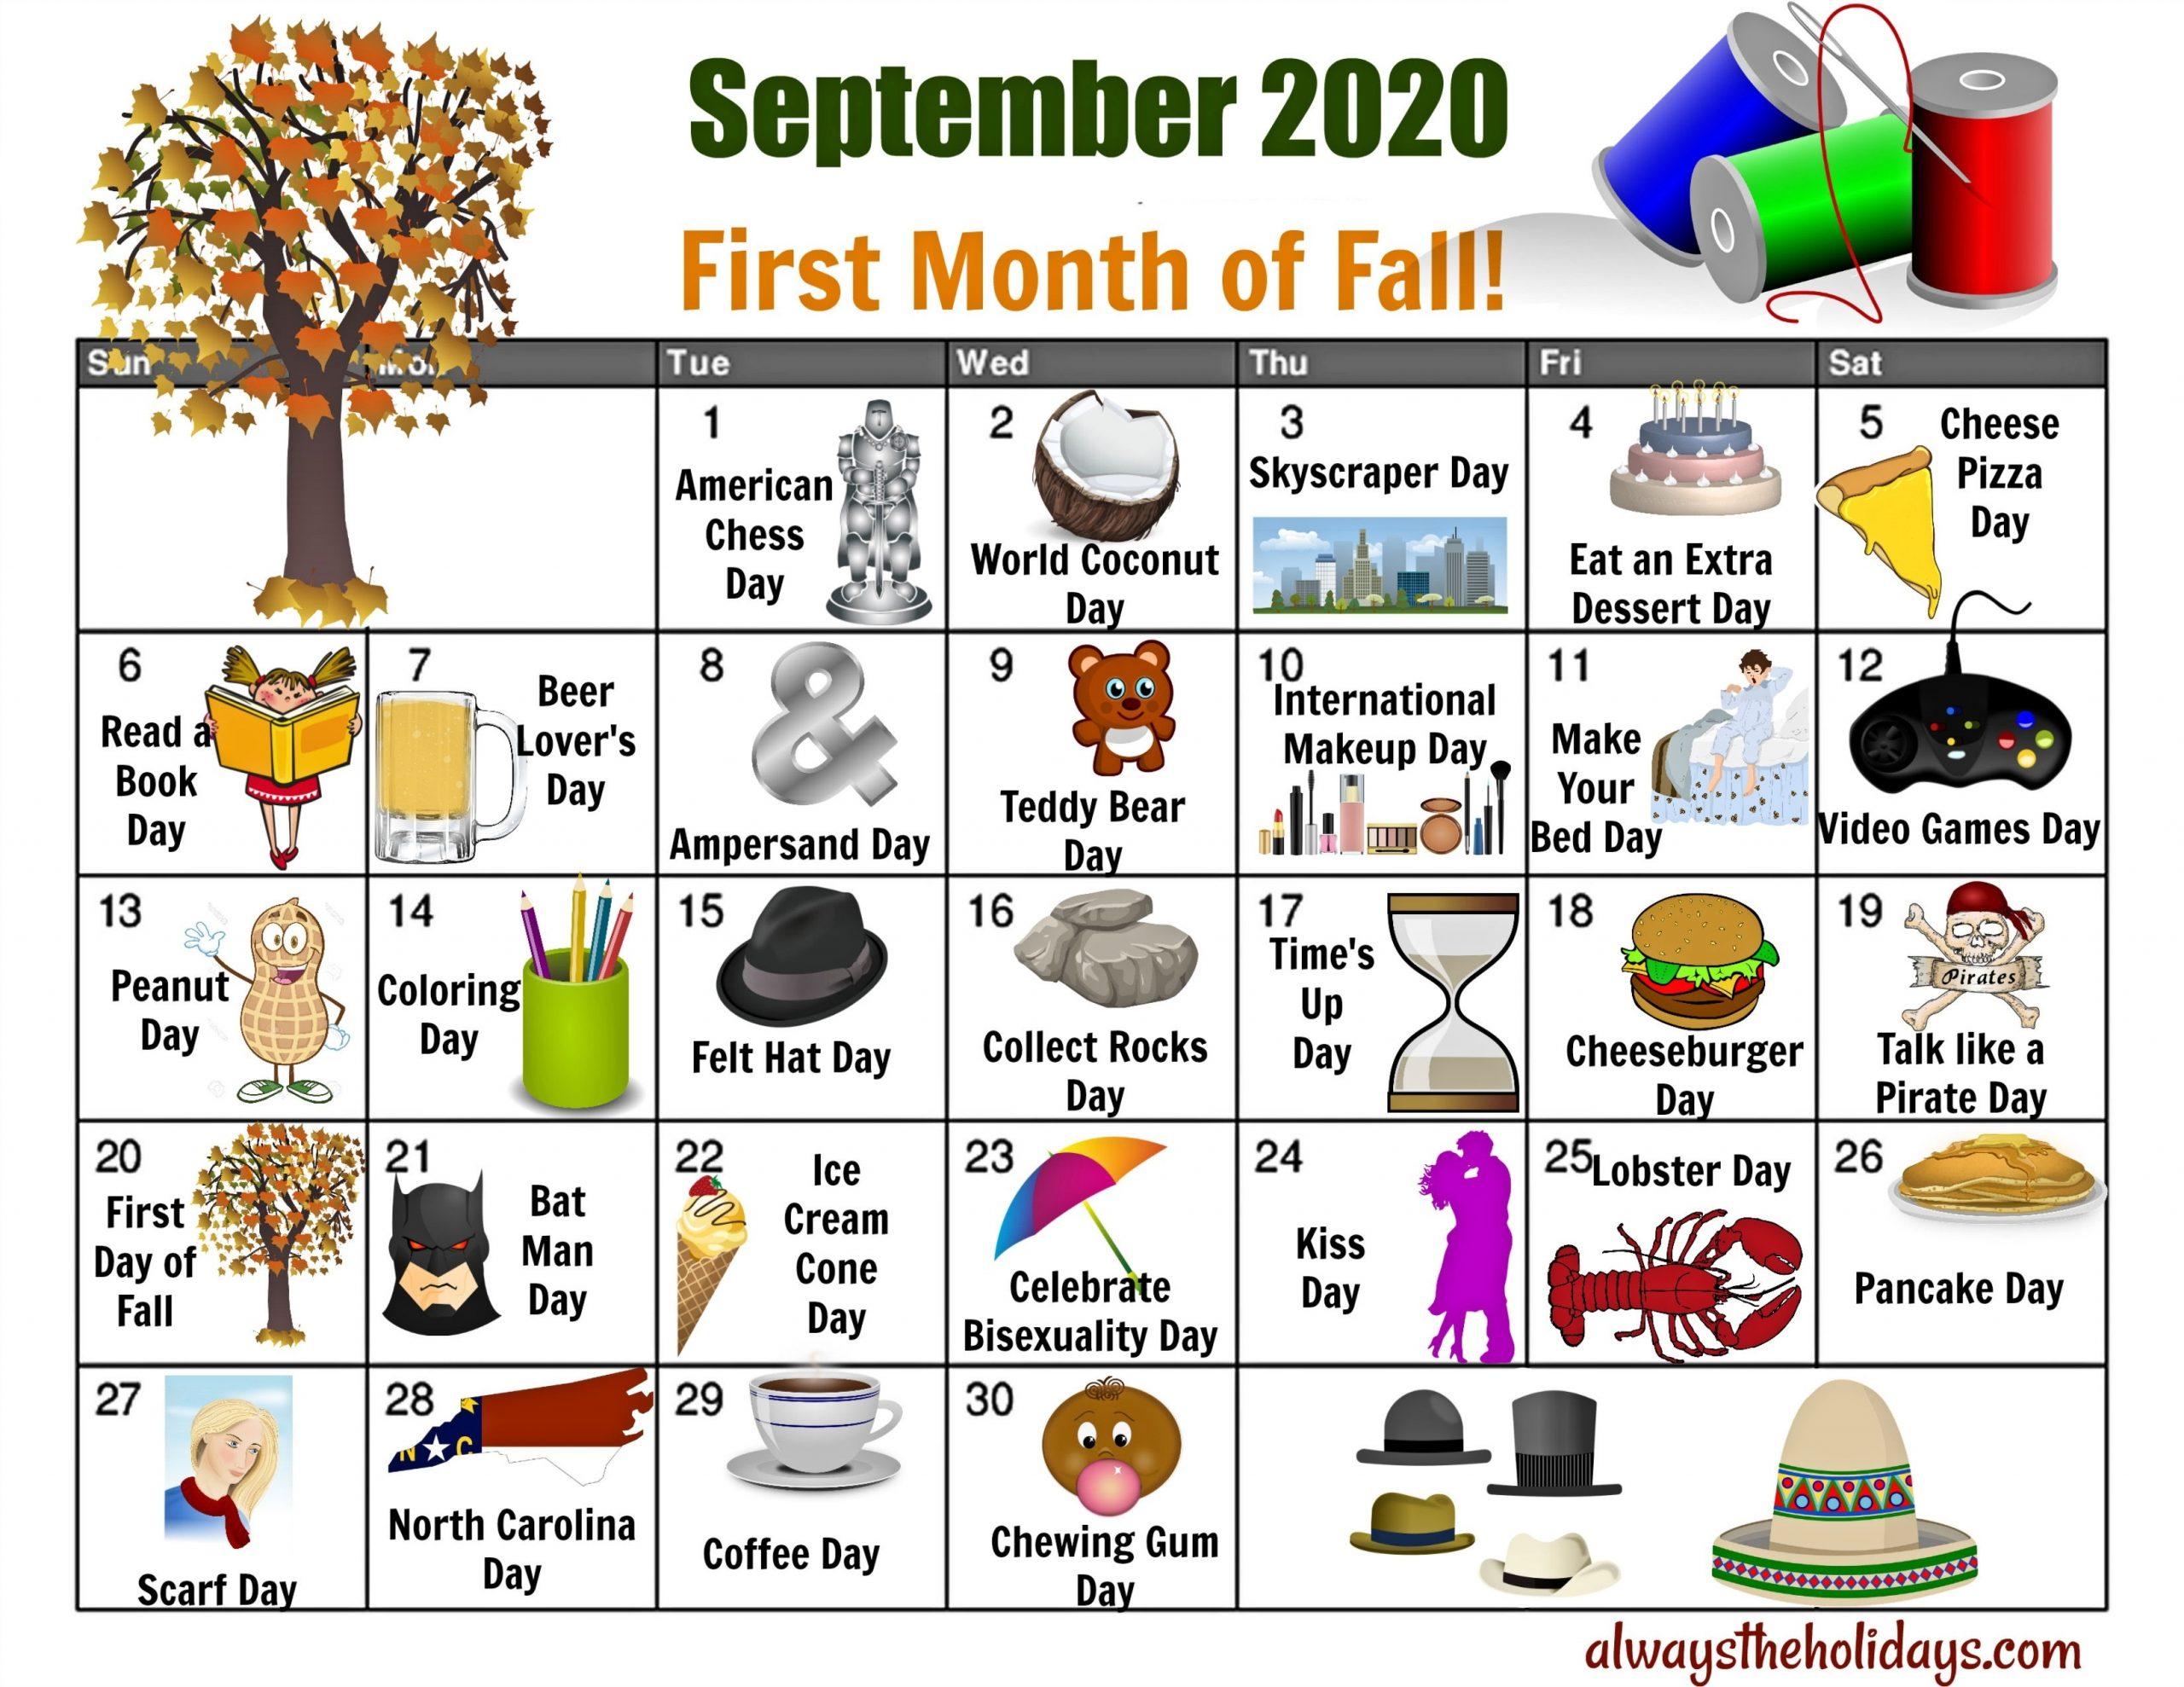 September National Day Calendar - Free Printable Calendars